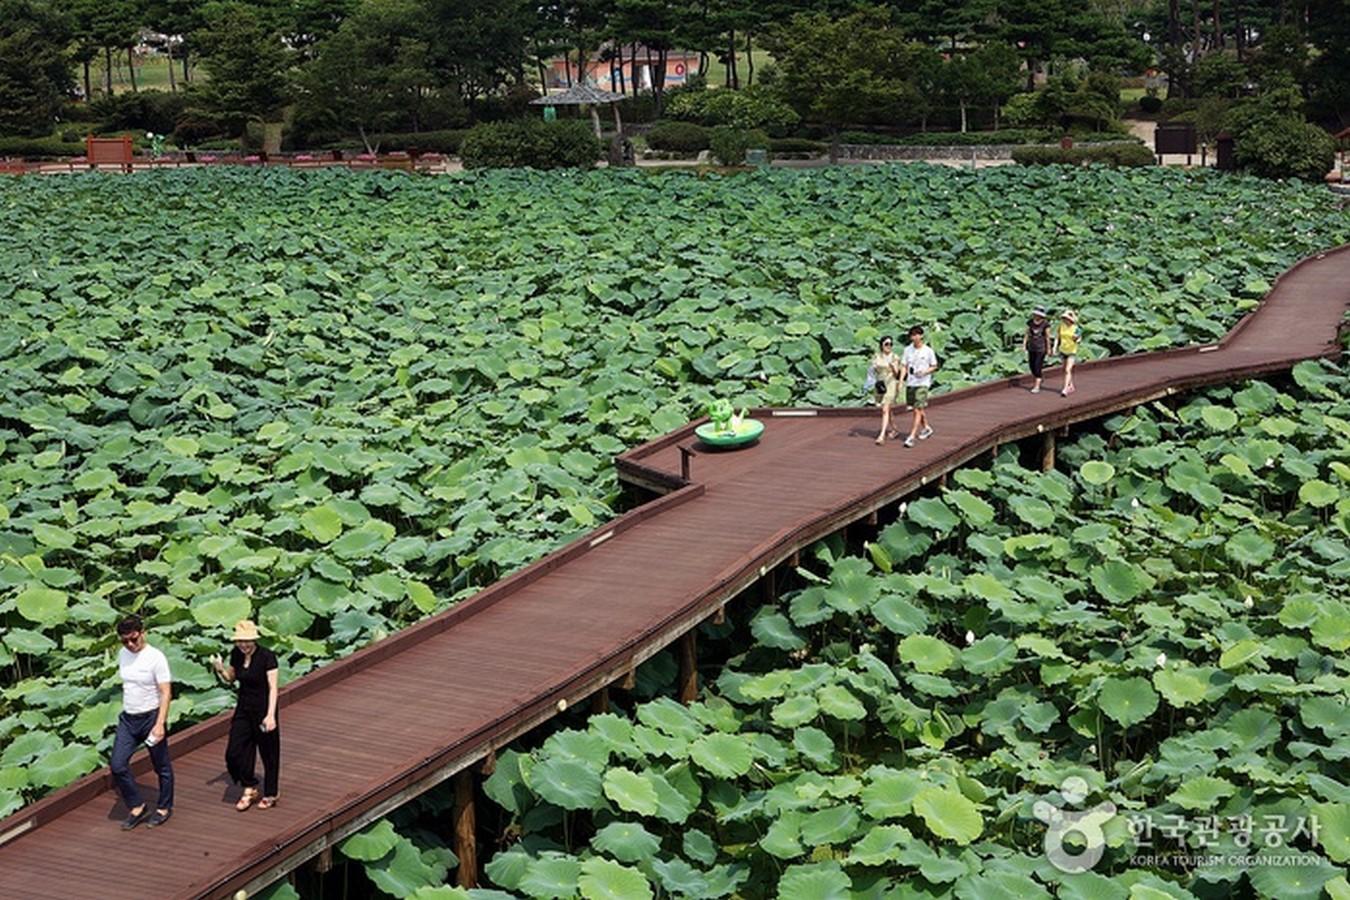 Hoesan White Lotus Pond, Jeonranamdo - Sheet2